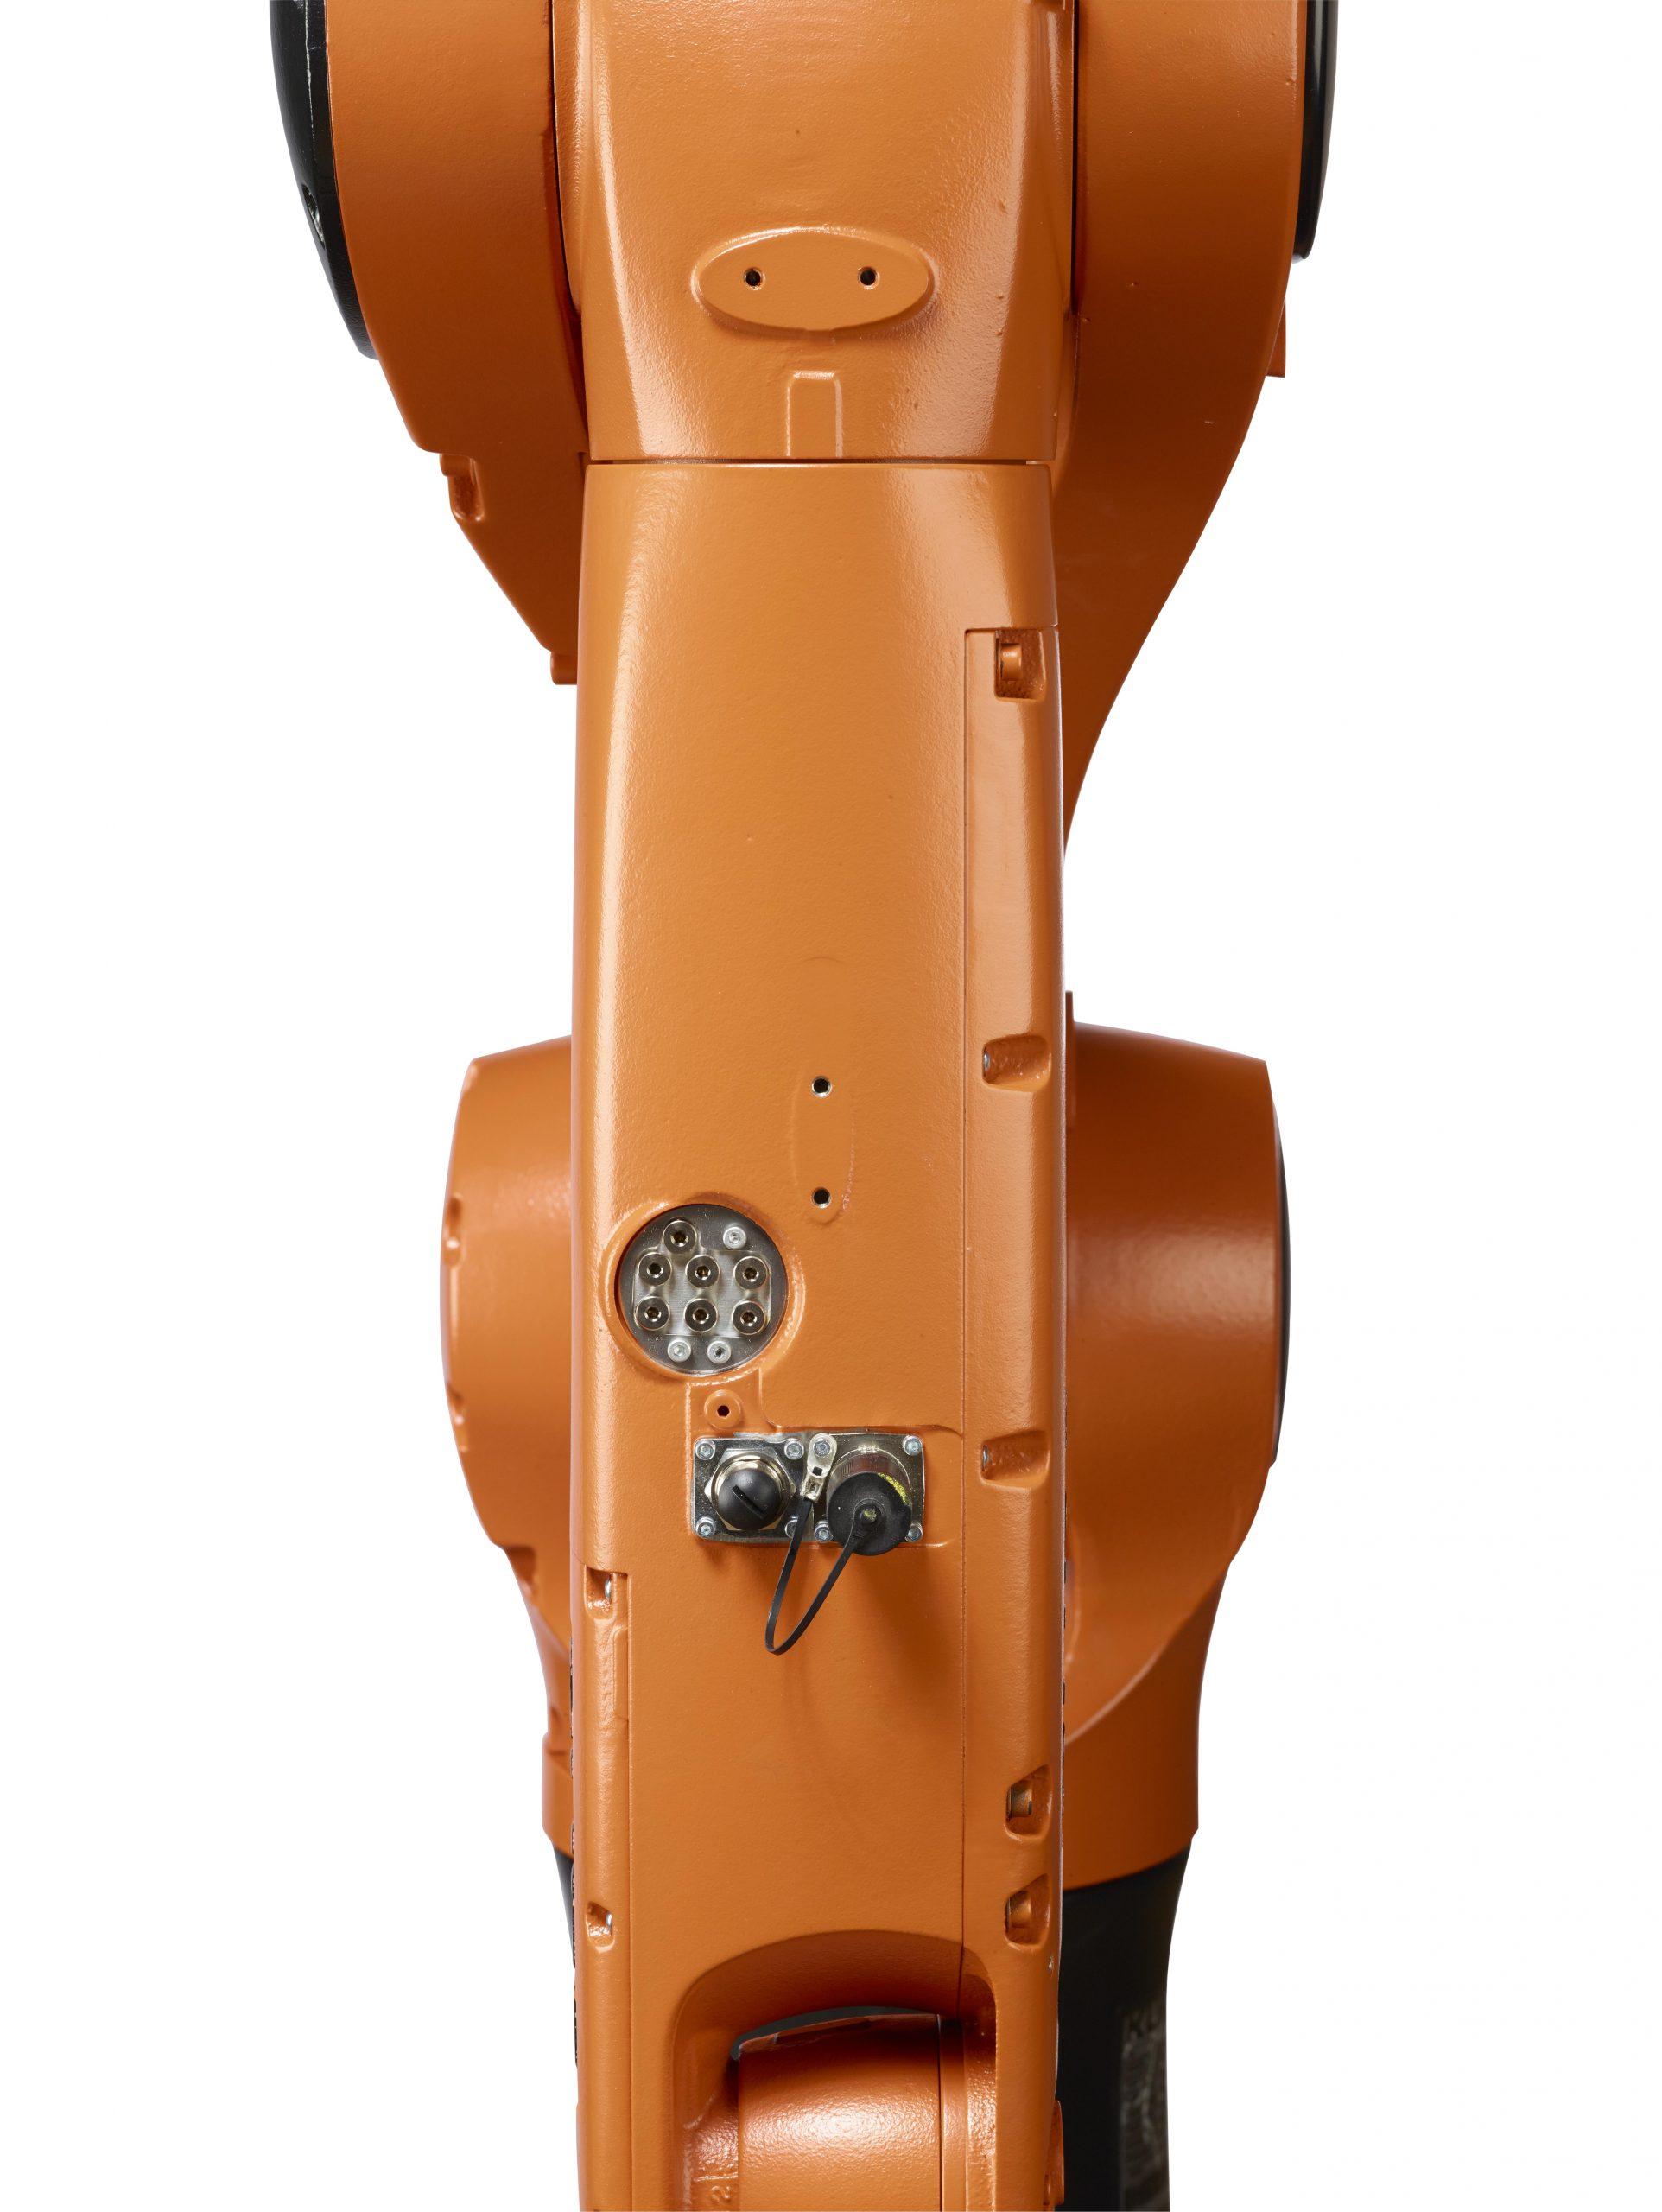 KUKA KR 6 R900 sixx WP (KR AGILUS)-8